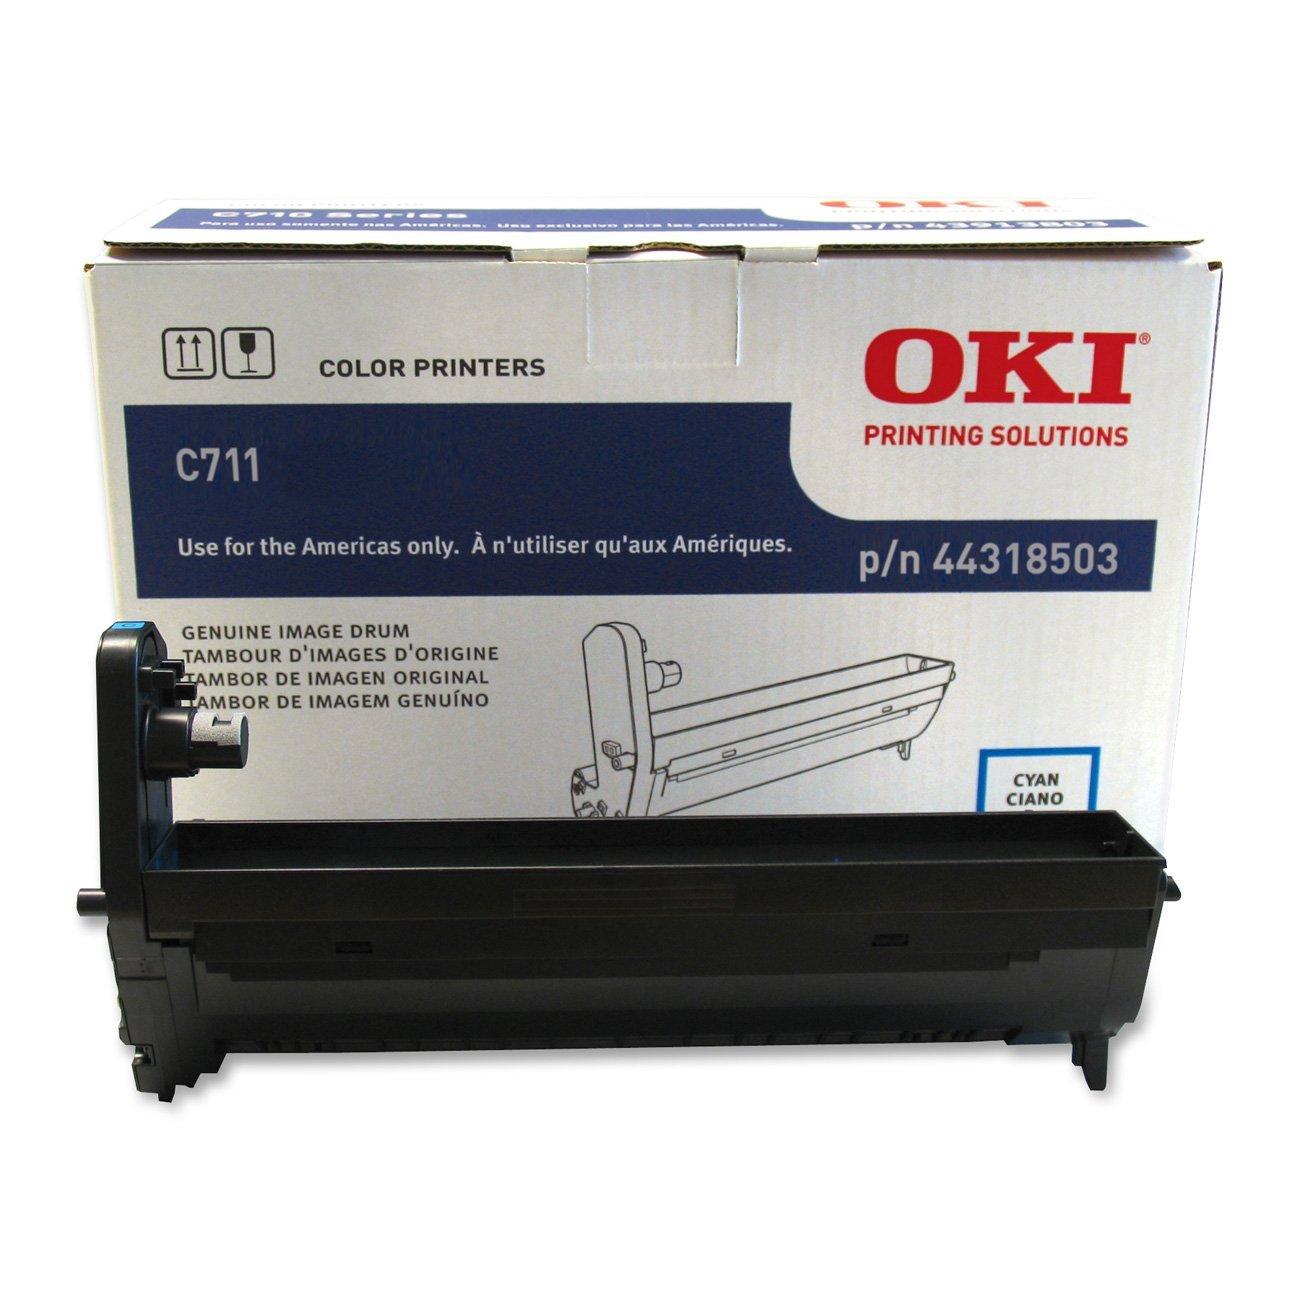 LD Compatible Okidata 44318604 4PK Black Toner Cartridges for OKI C711 Series